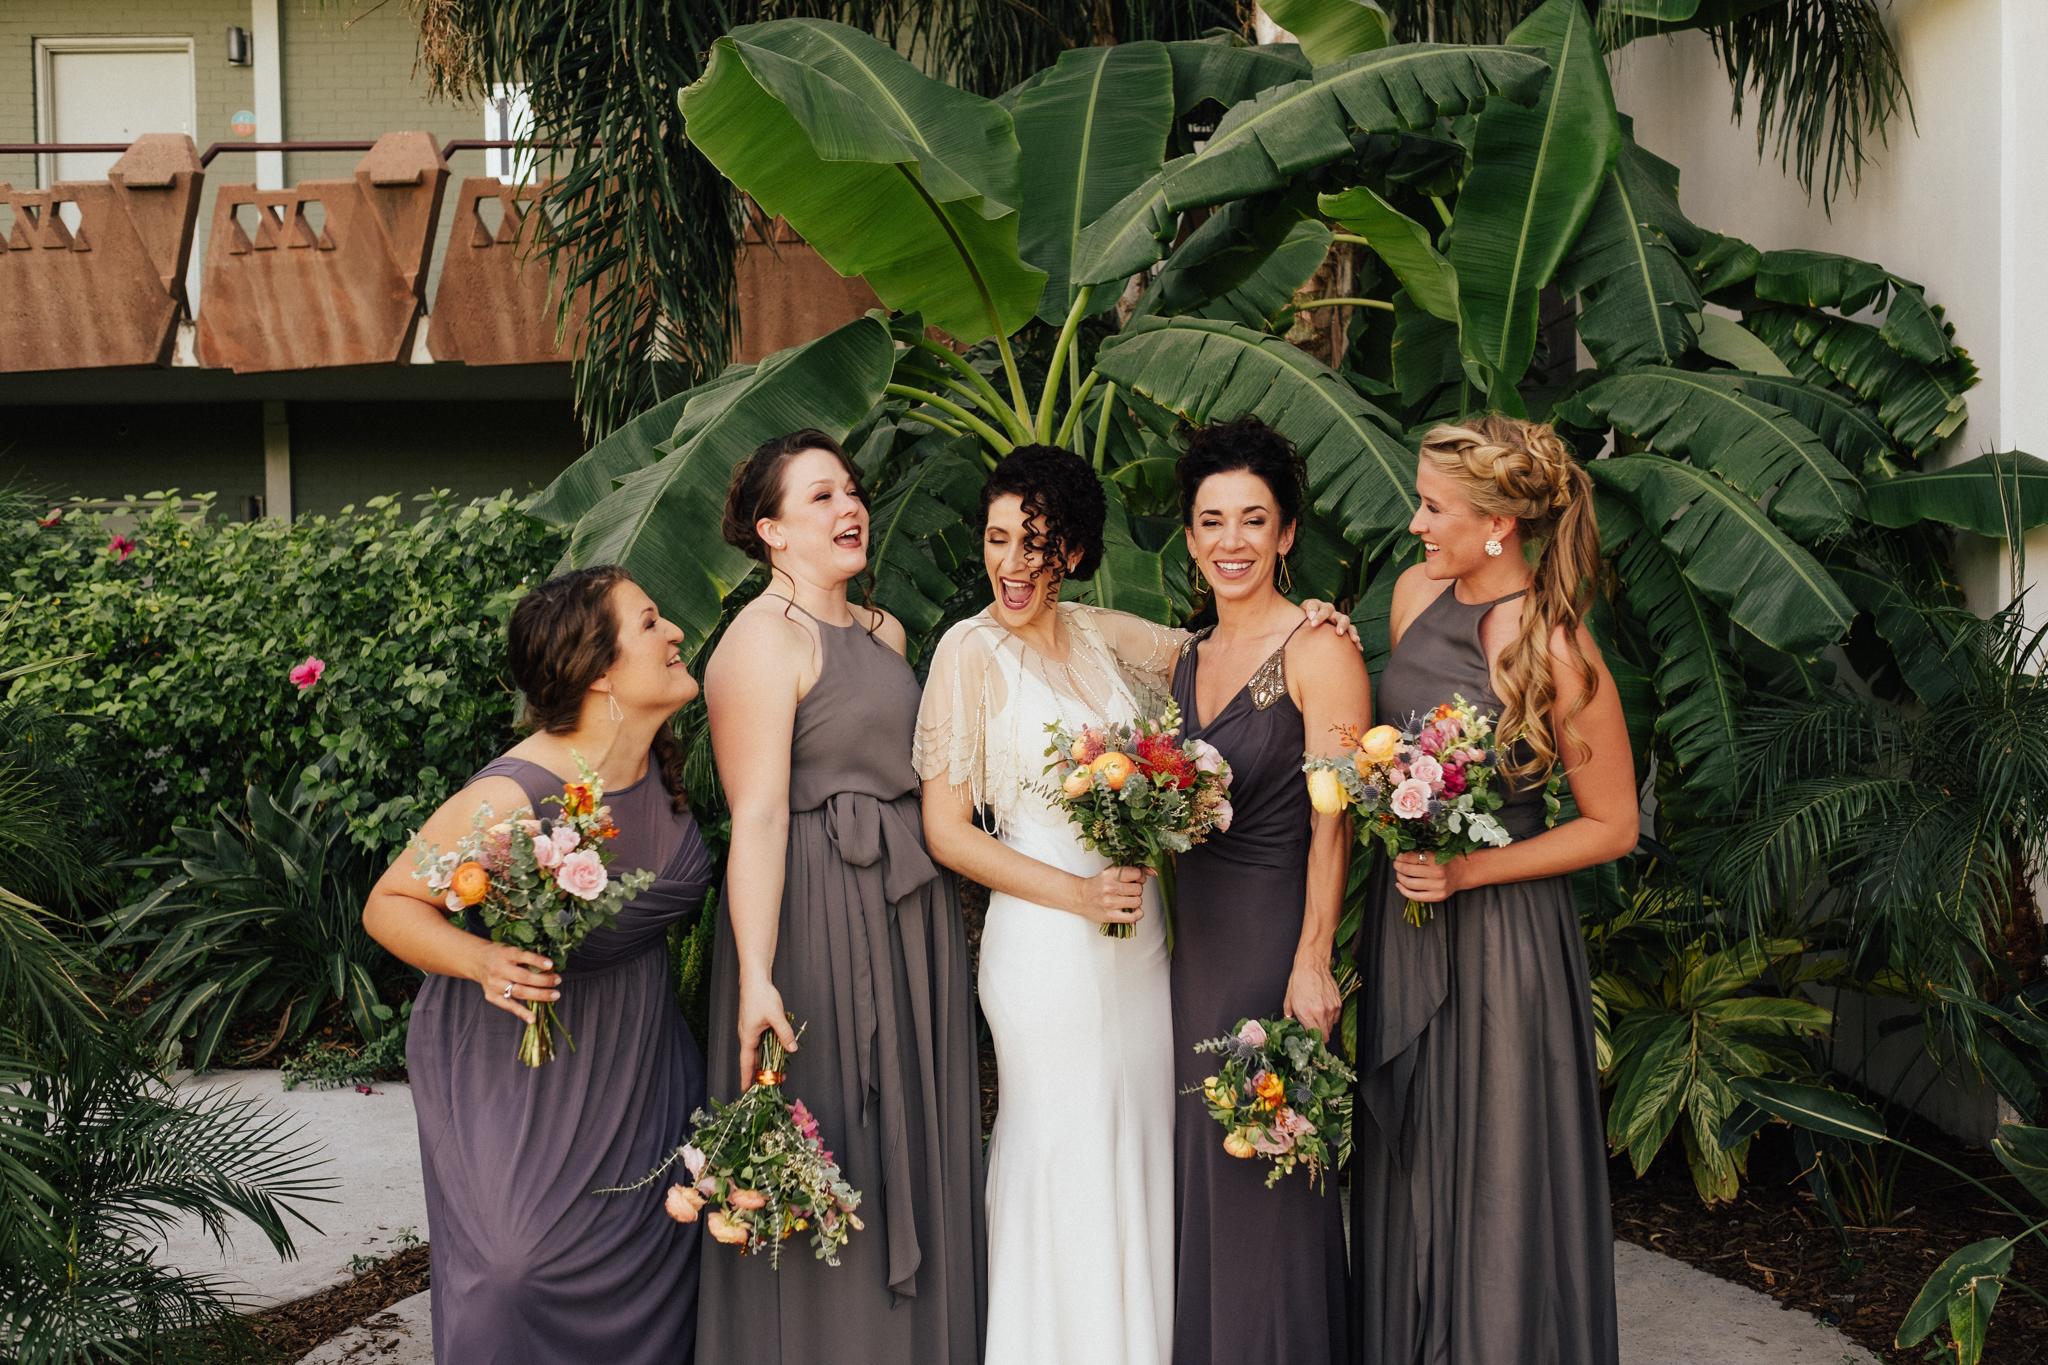 Arizona-Adventure-Elopement-Wedding-Photographer-147.jpg